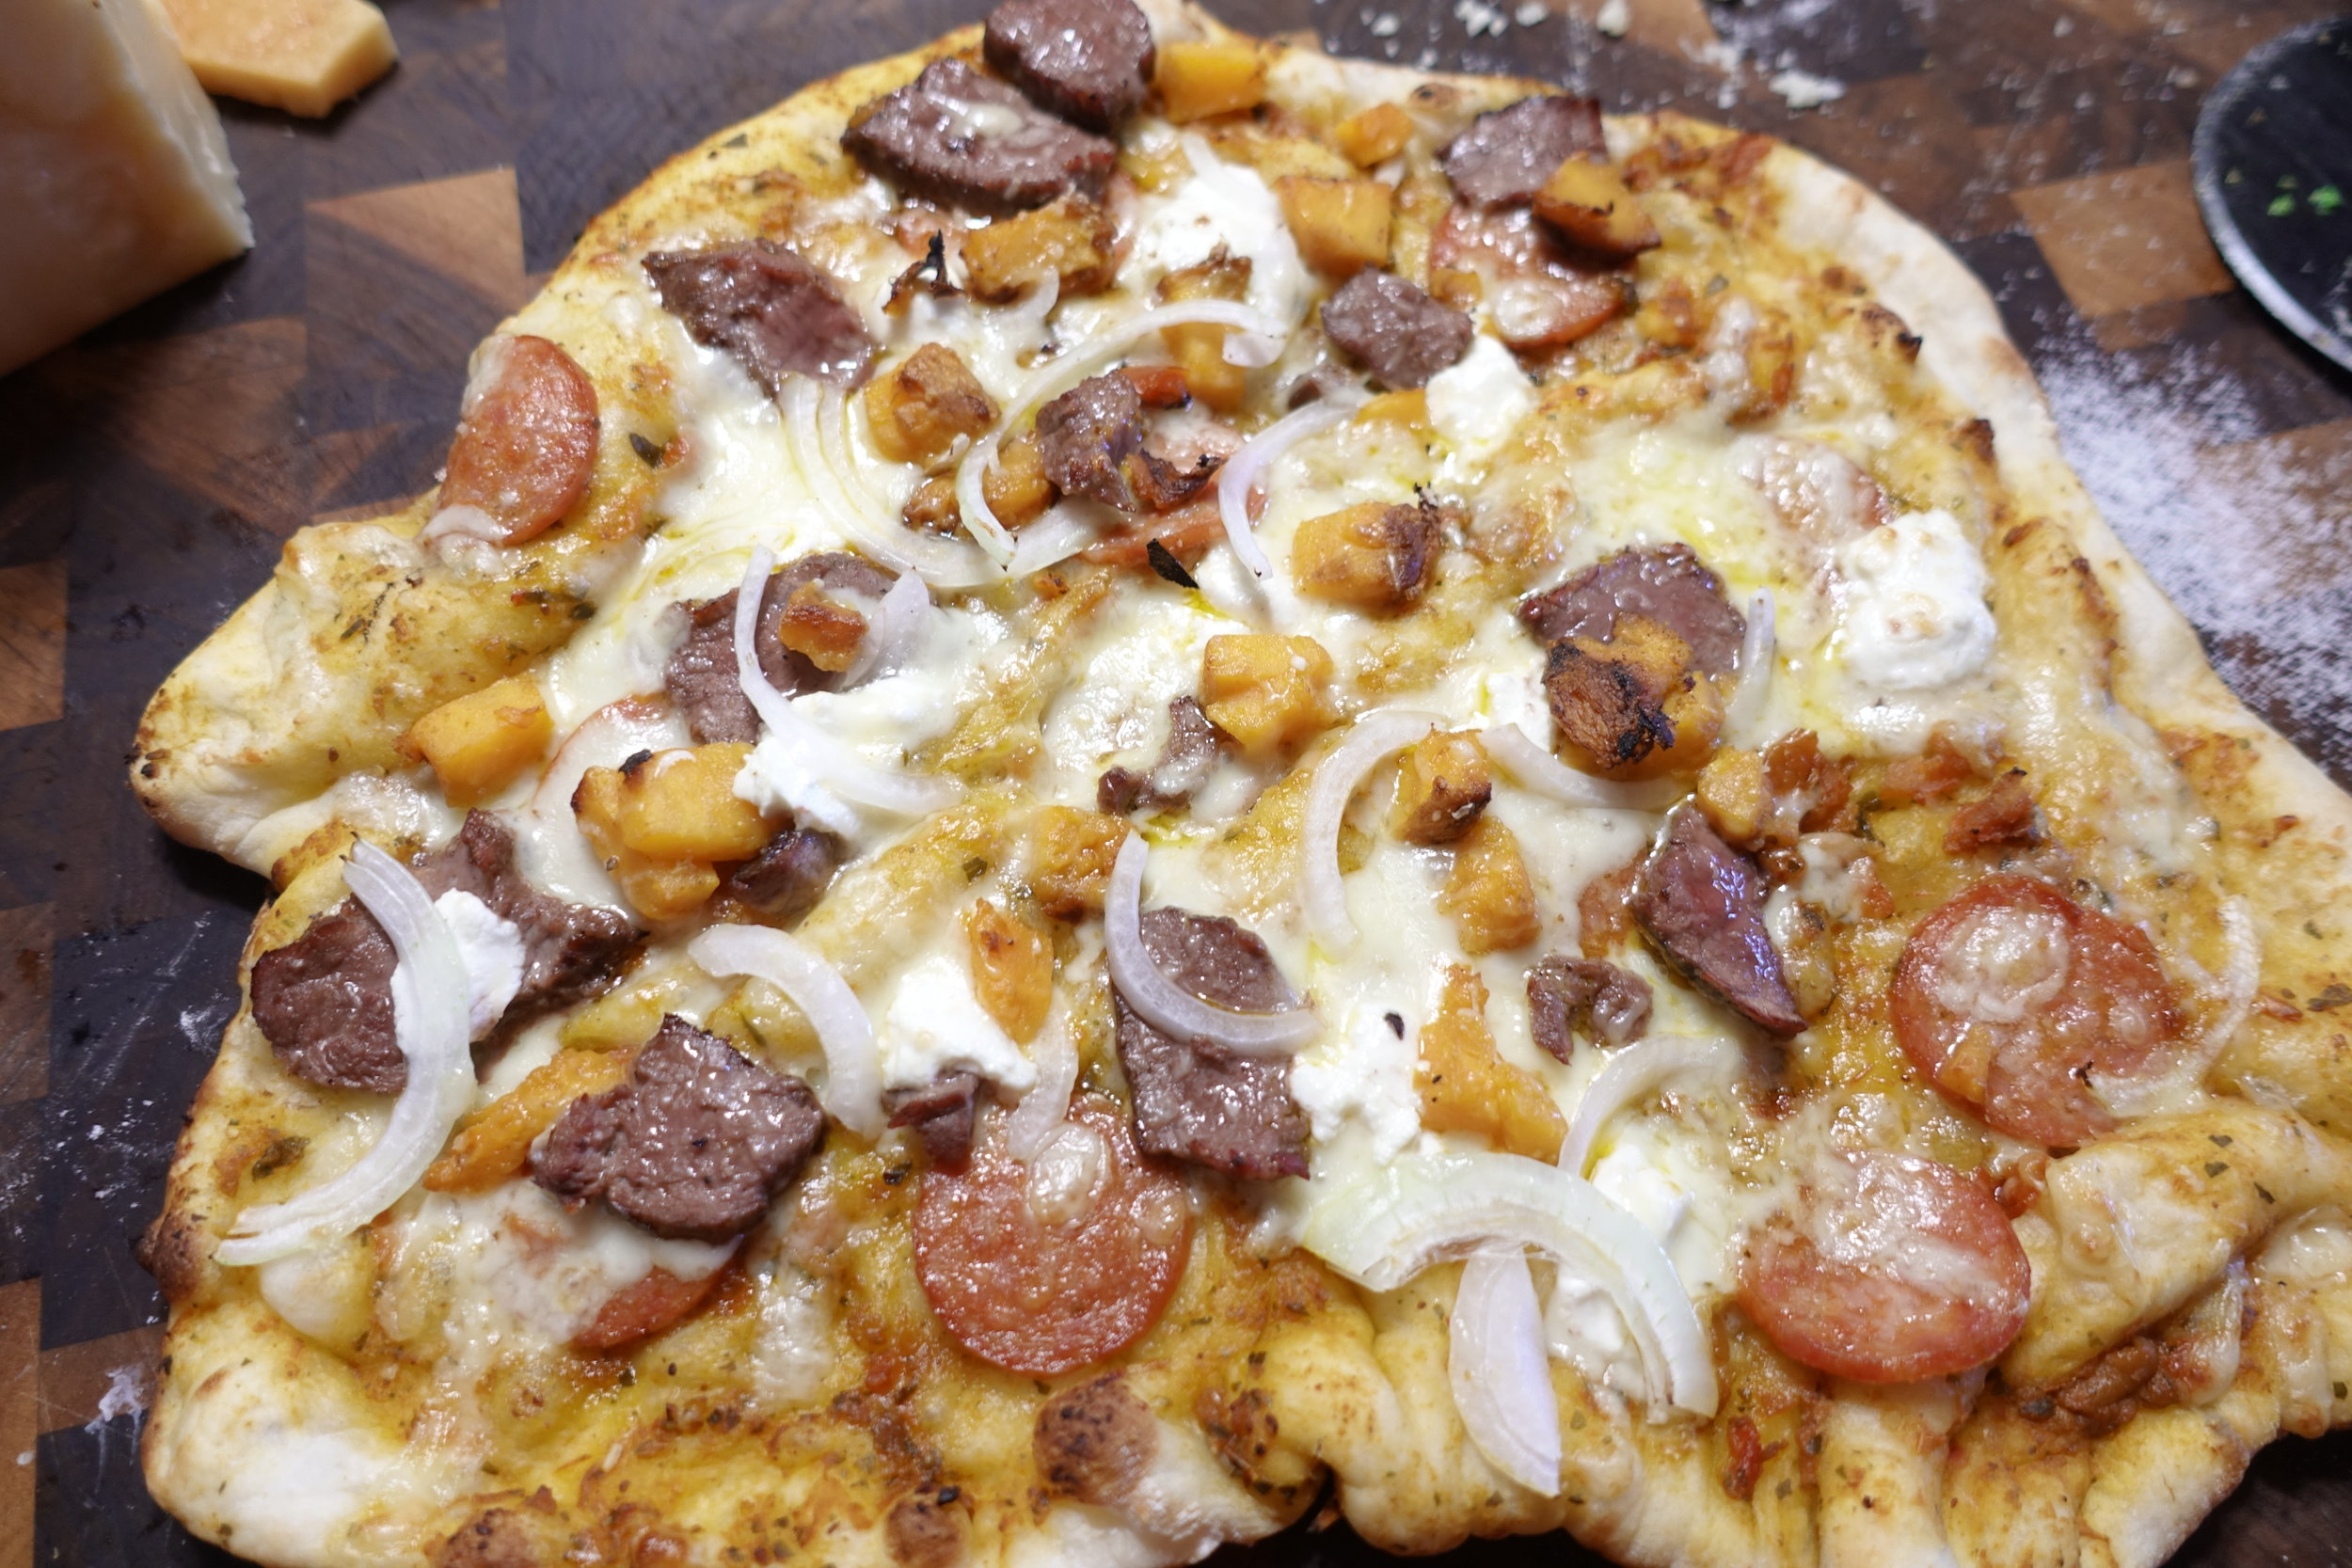 Chorizo, Pepperoni, Sweet Potato, Onion and Cheese Pizza (Goat, Mozzarella and Parmasan)